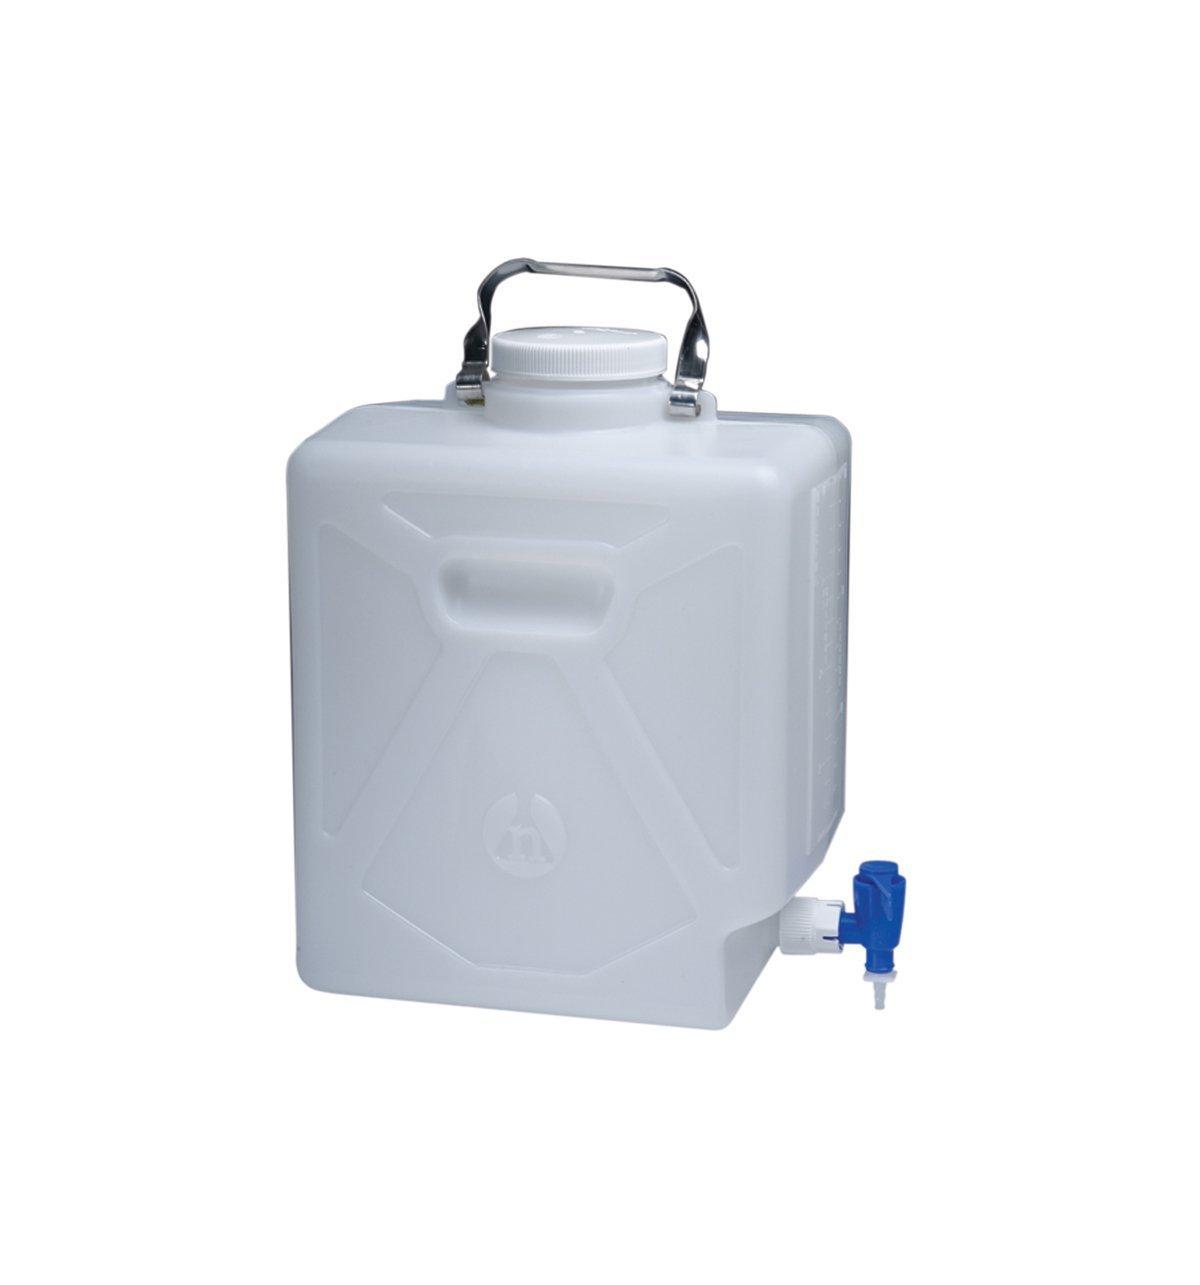 Nalgene High Density Polyethylene Rectangular Carboy with Spigot, 20L